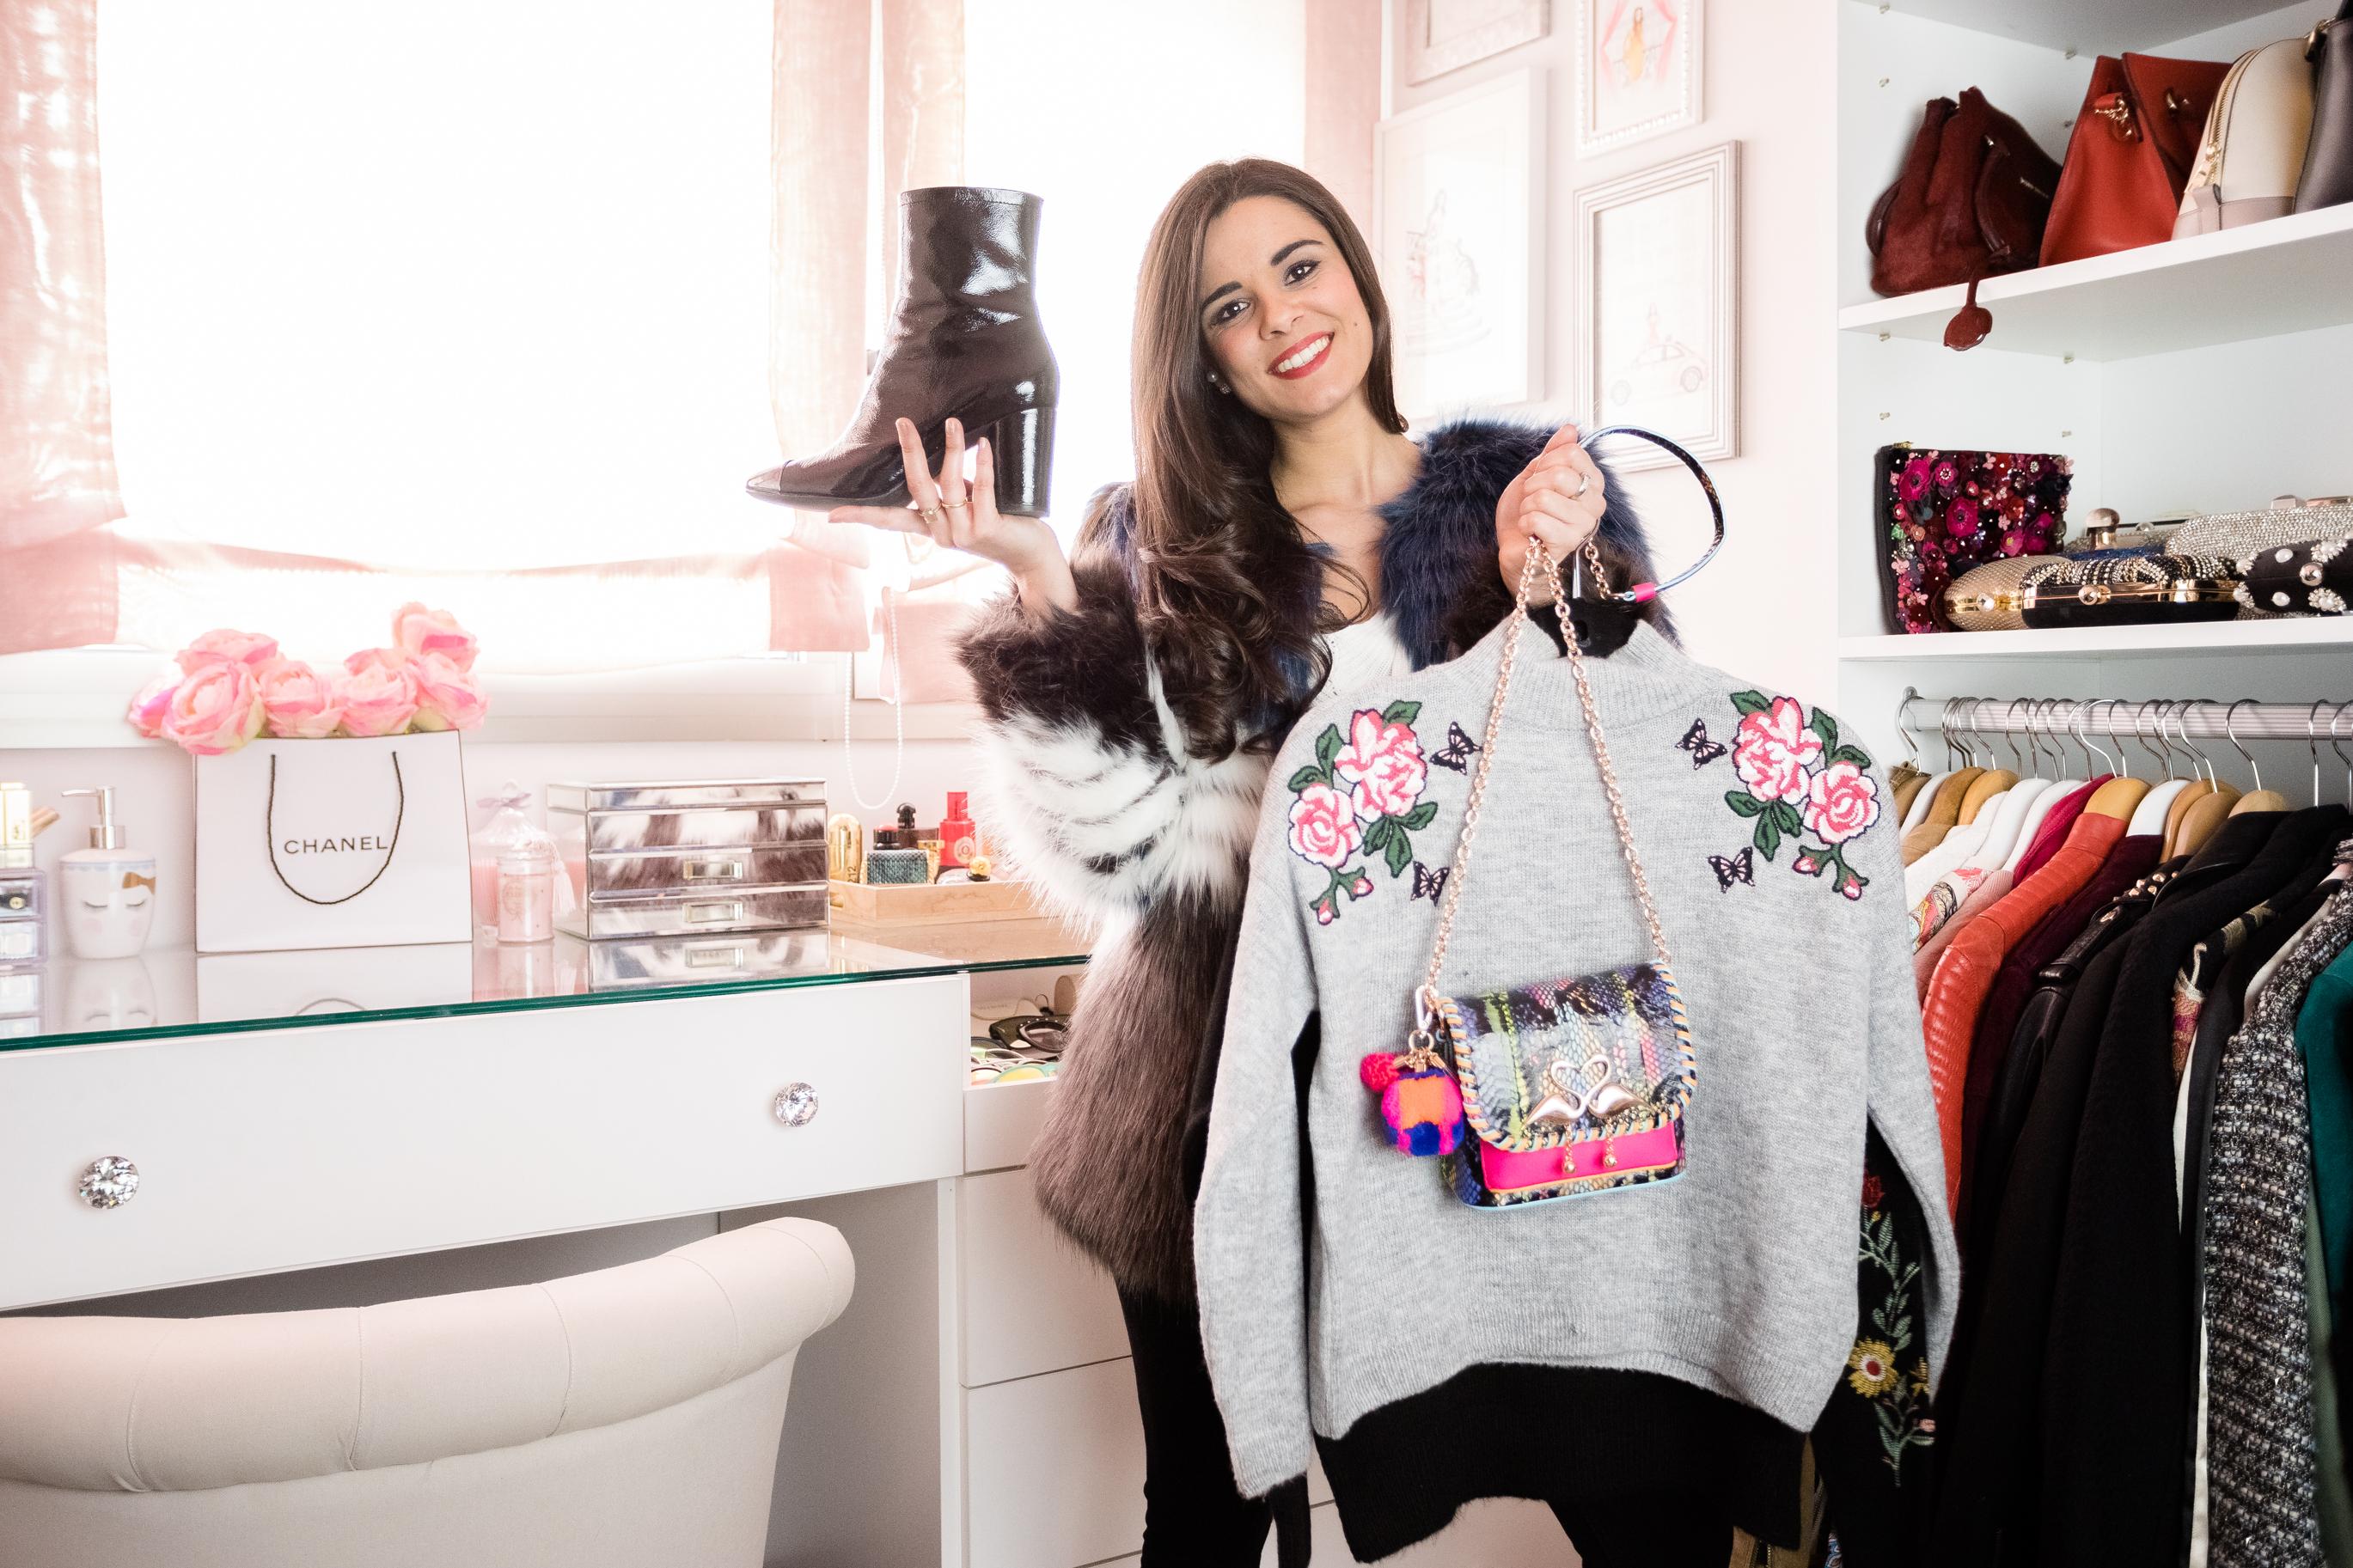 Vídeo haul de moda febrero-21594-crimenesdelamoda